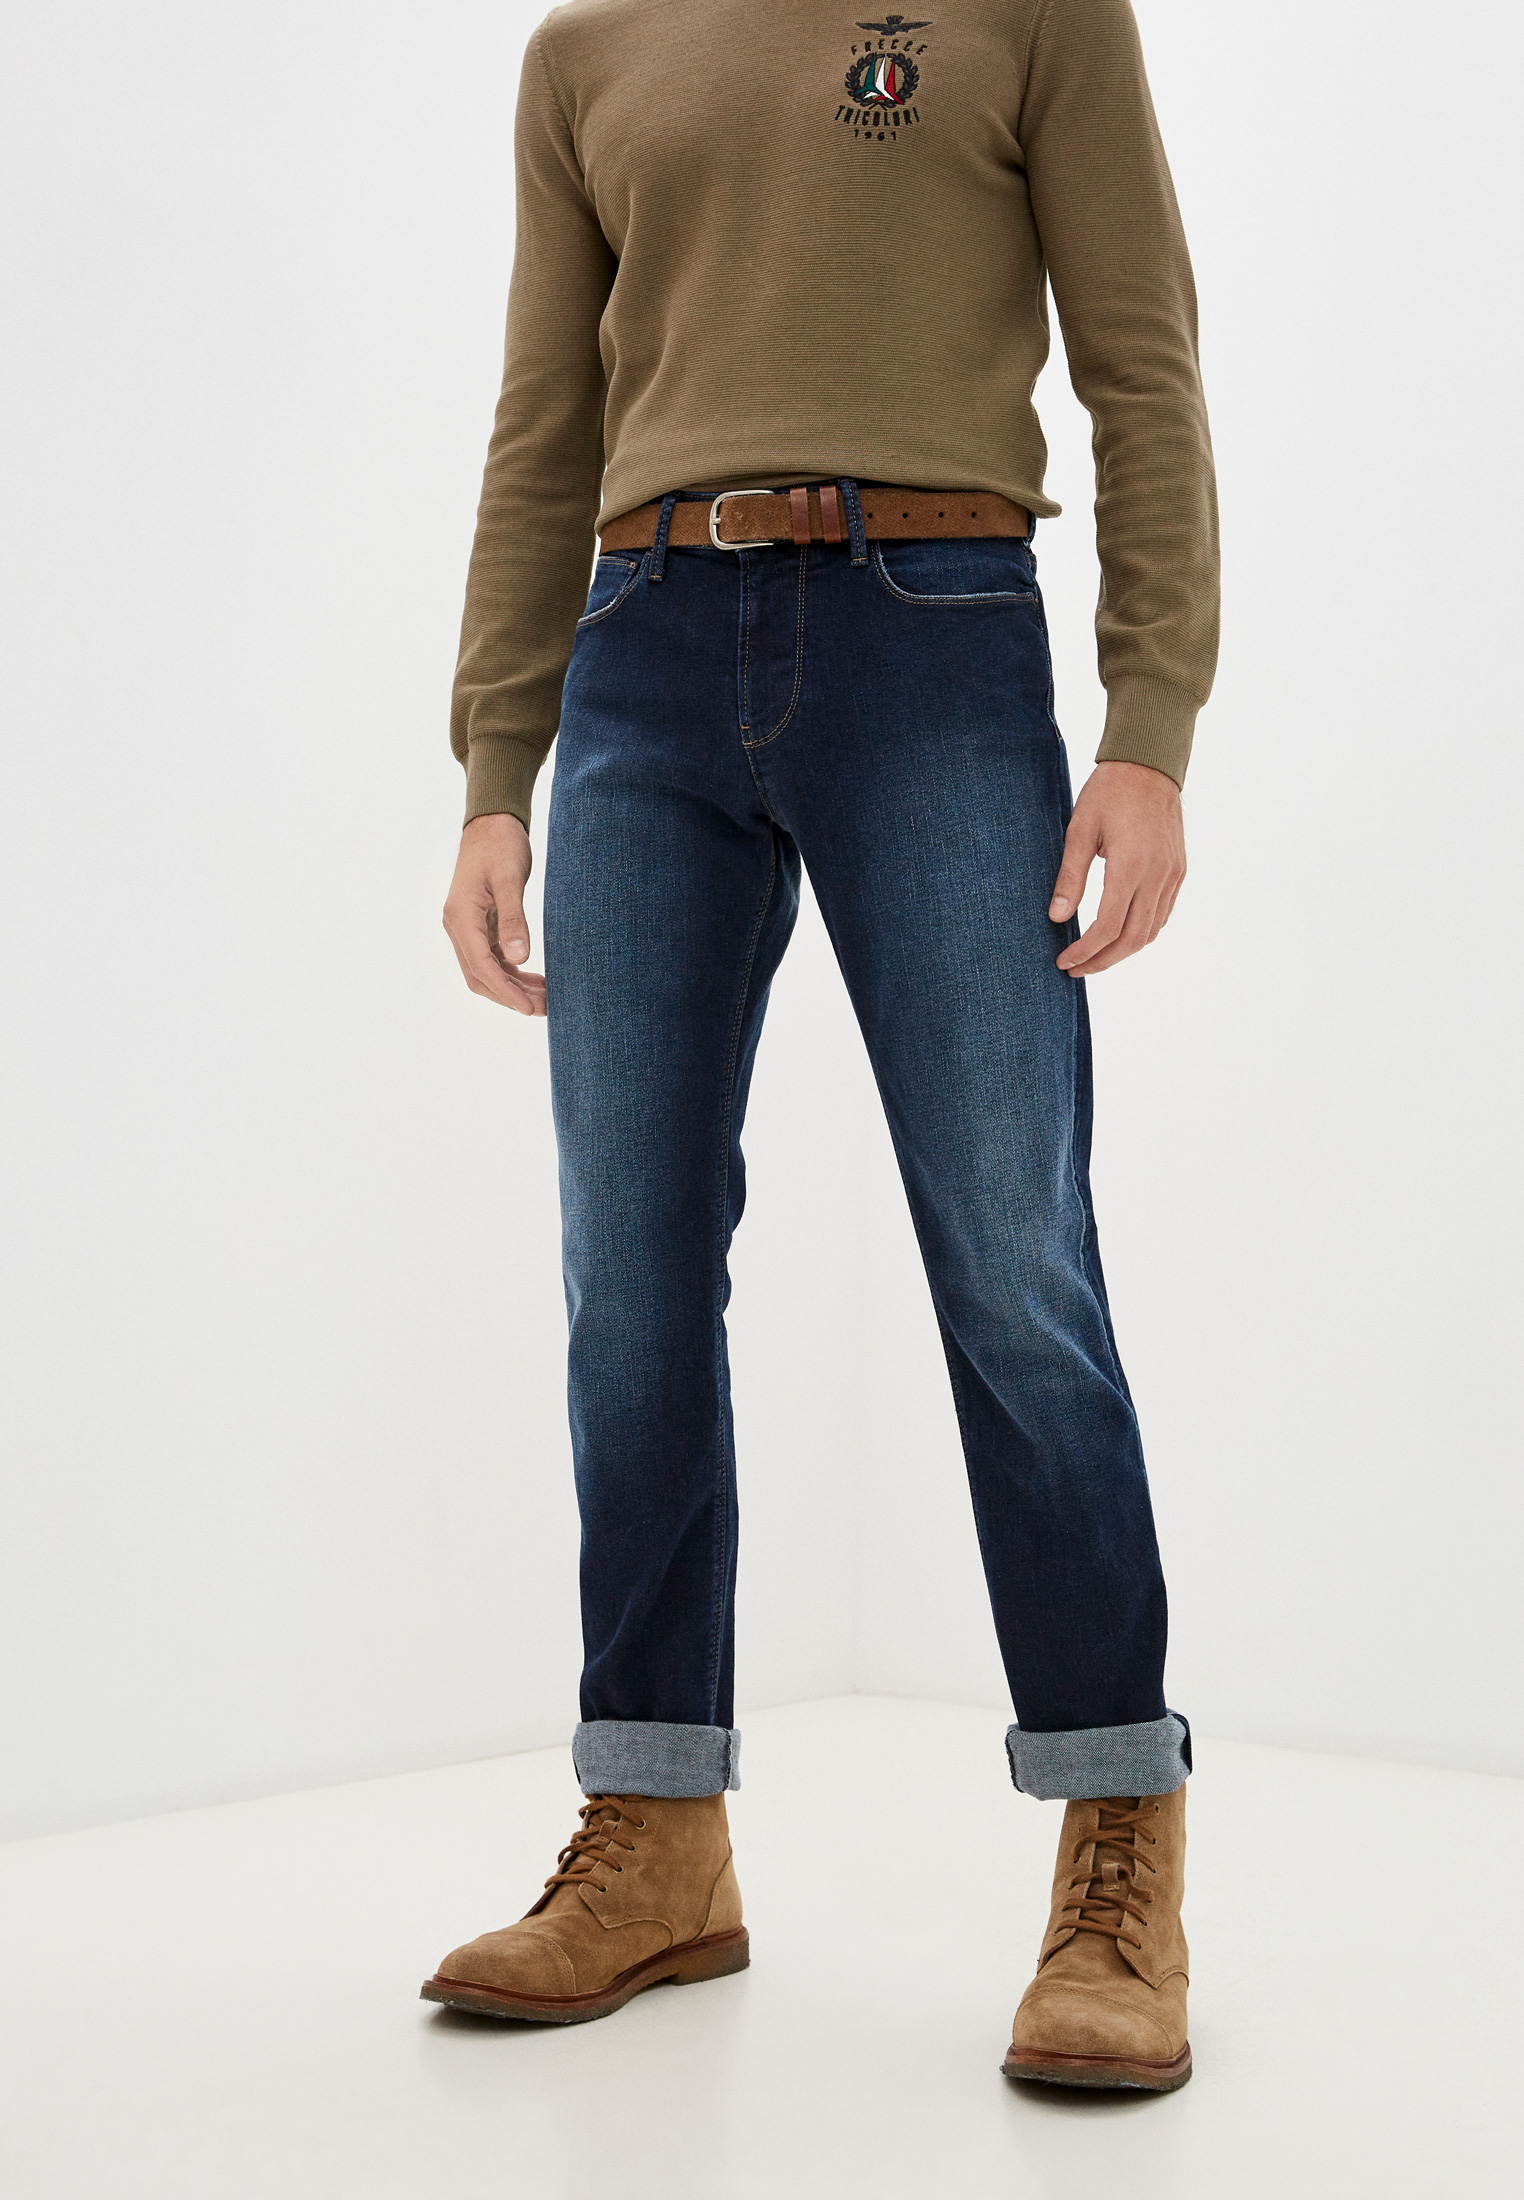 Мужские зауженные джинсы Emporio Armani (Эмпорио Армани) 6K1J06 1DQ0Z